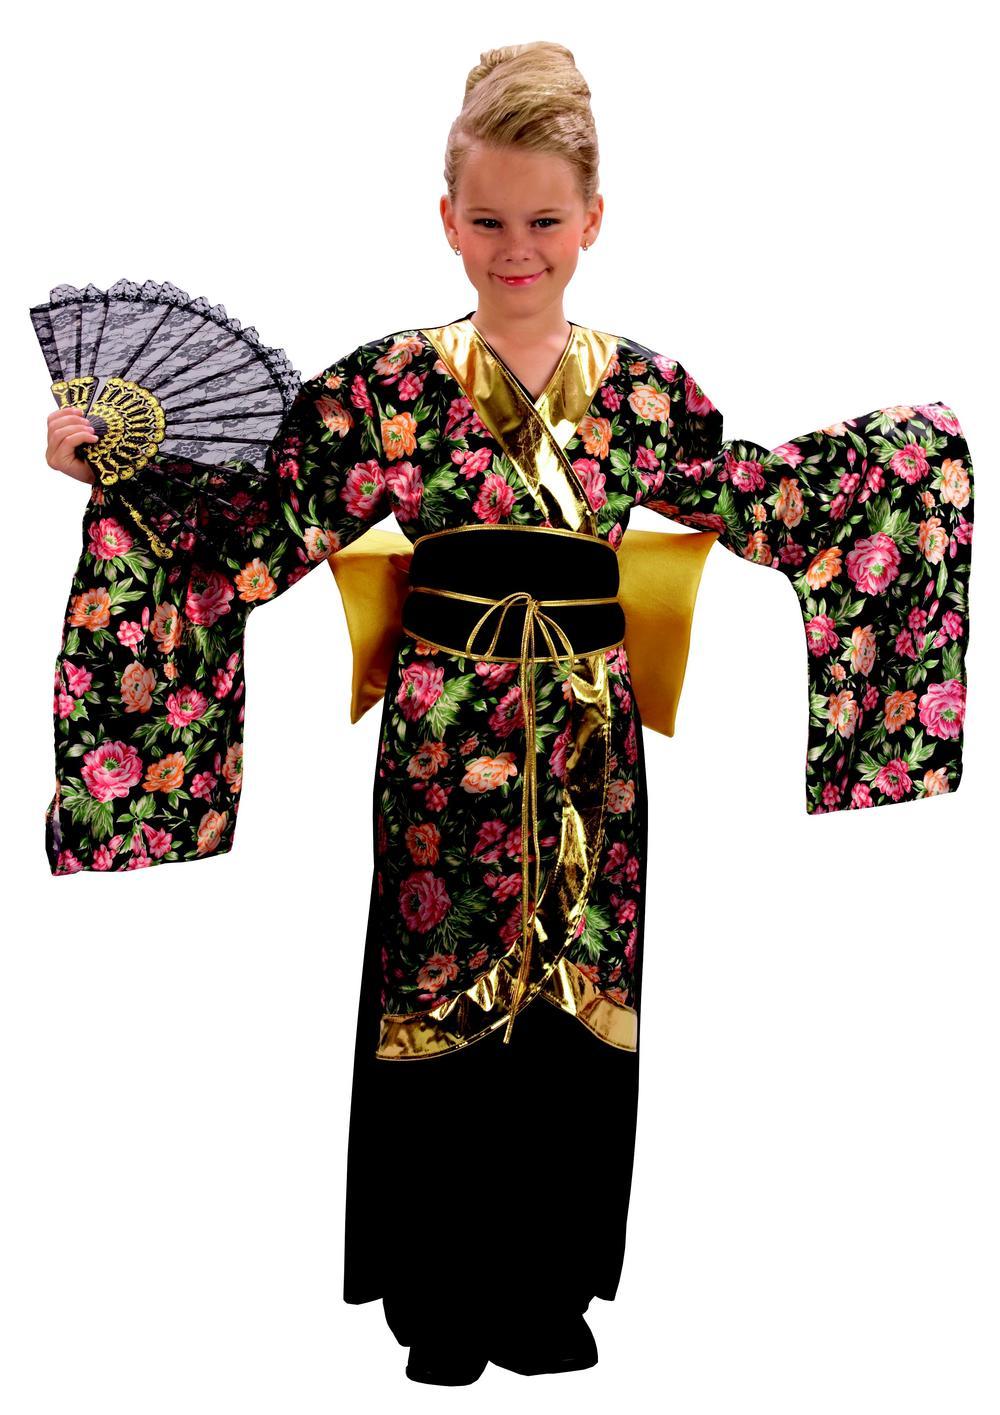 Geisha Kimono Girls Fancy Dress Japanese National Dress Kids Costume Outfit New